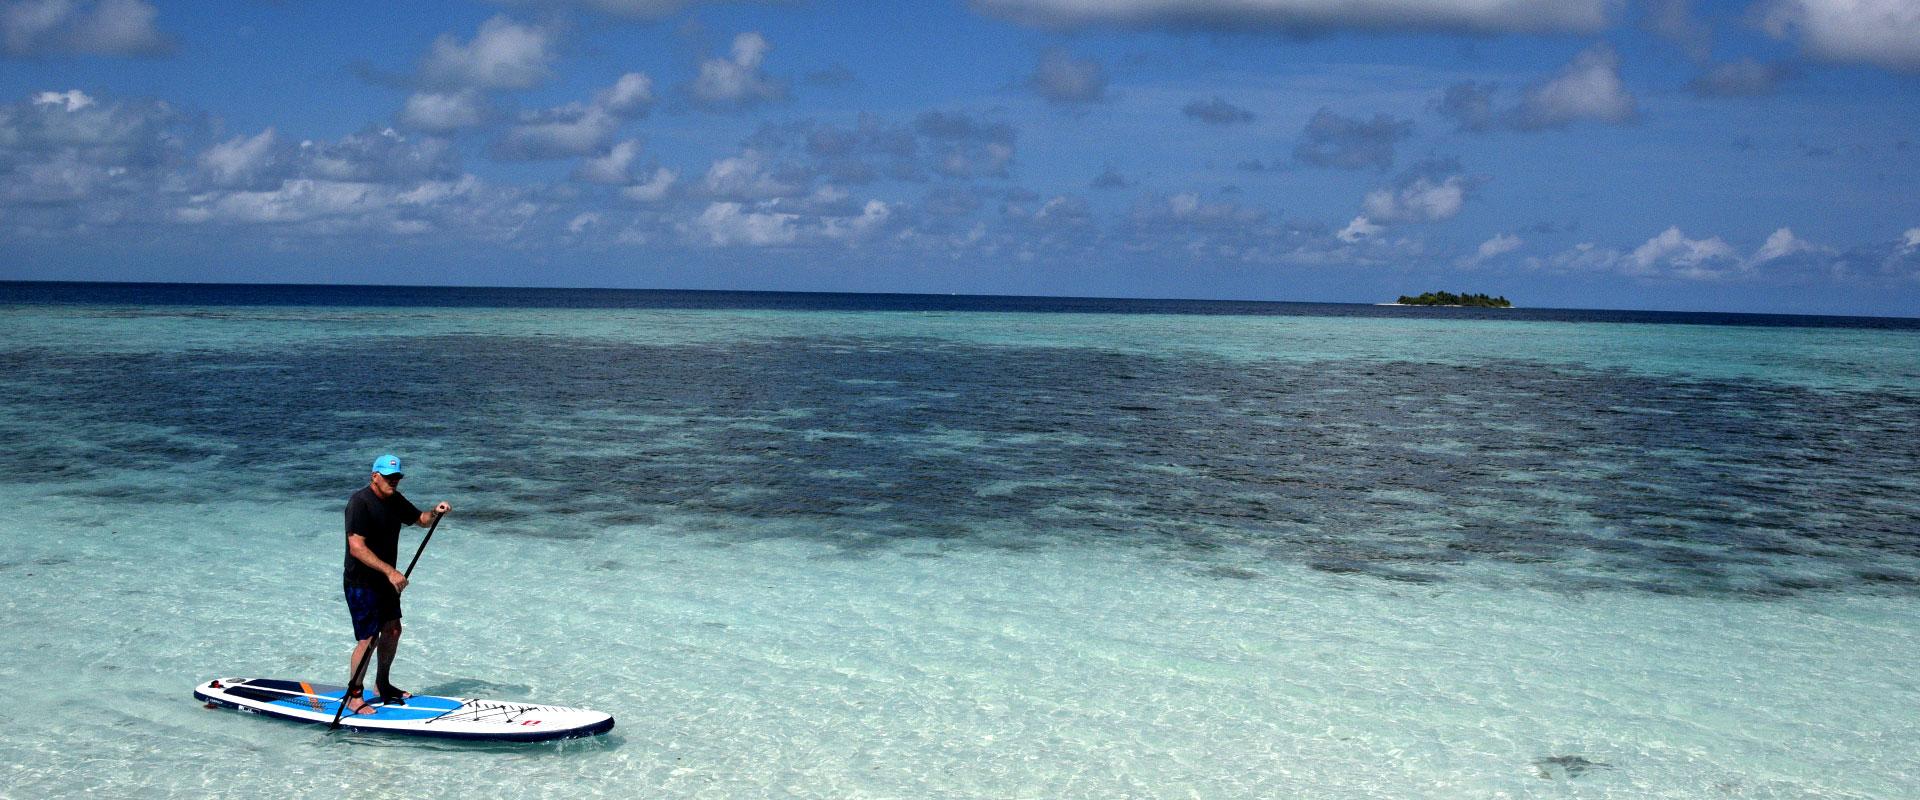 blog-header-compact-ocean